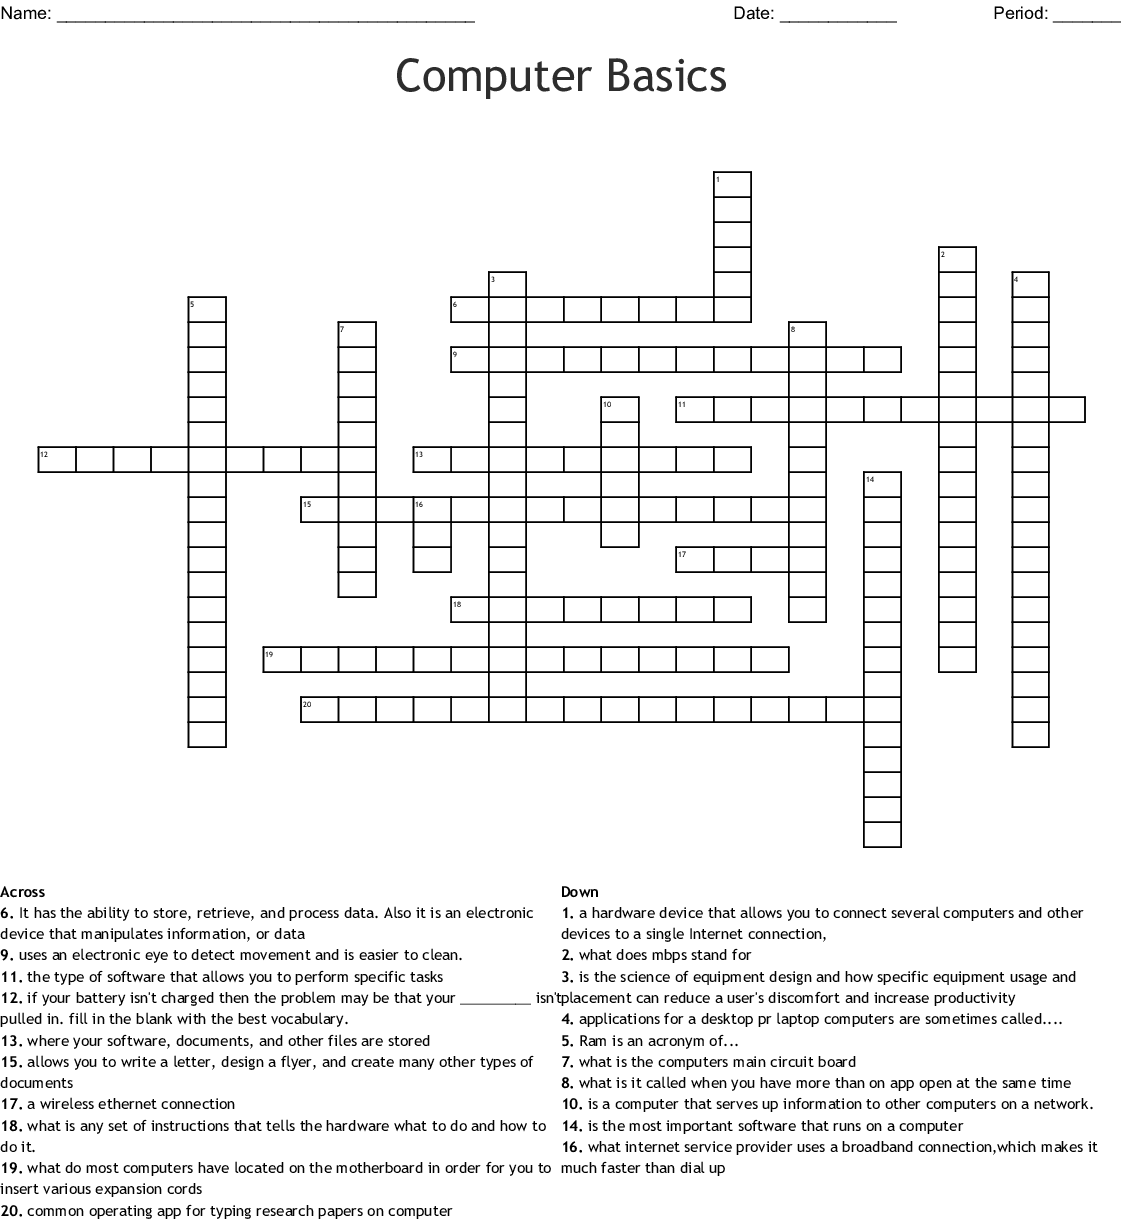 Computer Basics Worksheet Answers